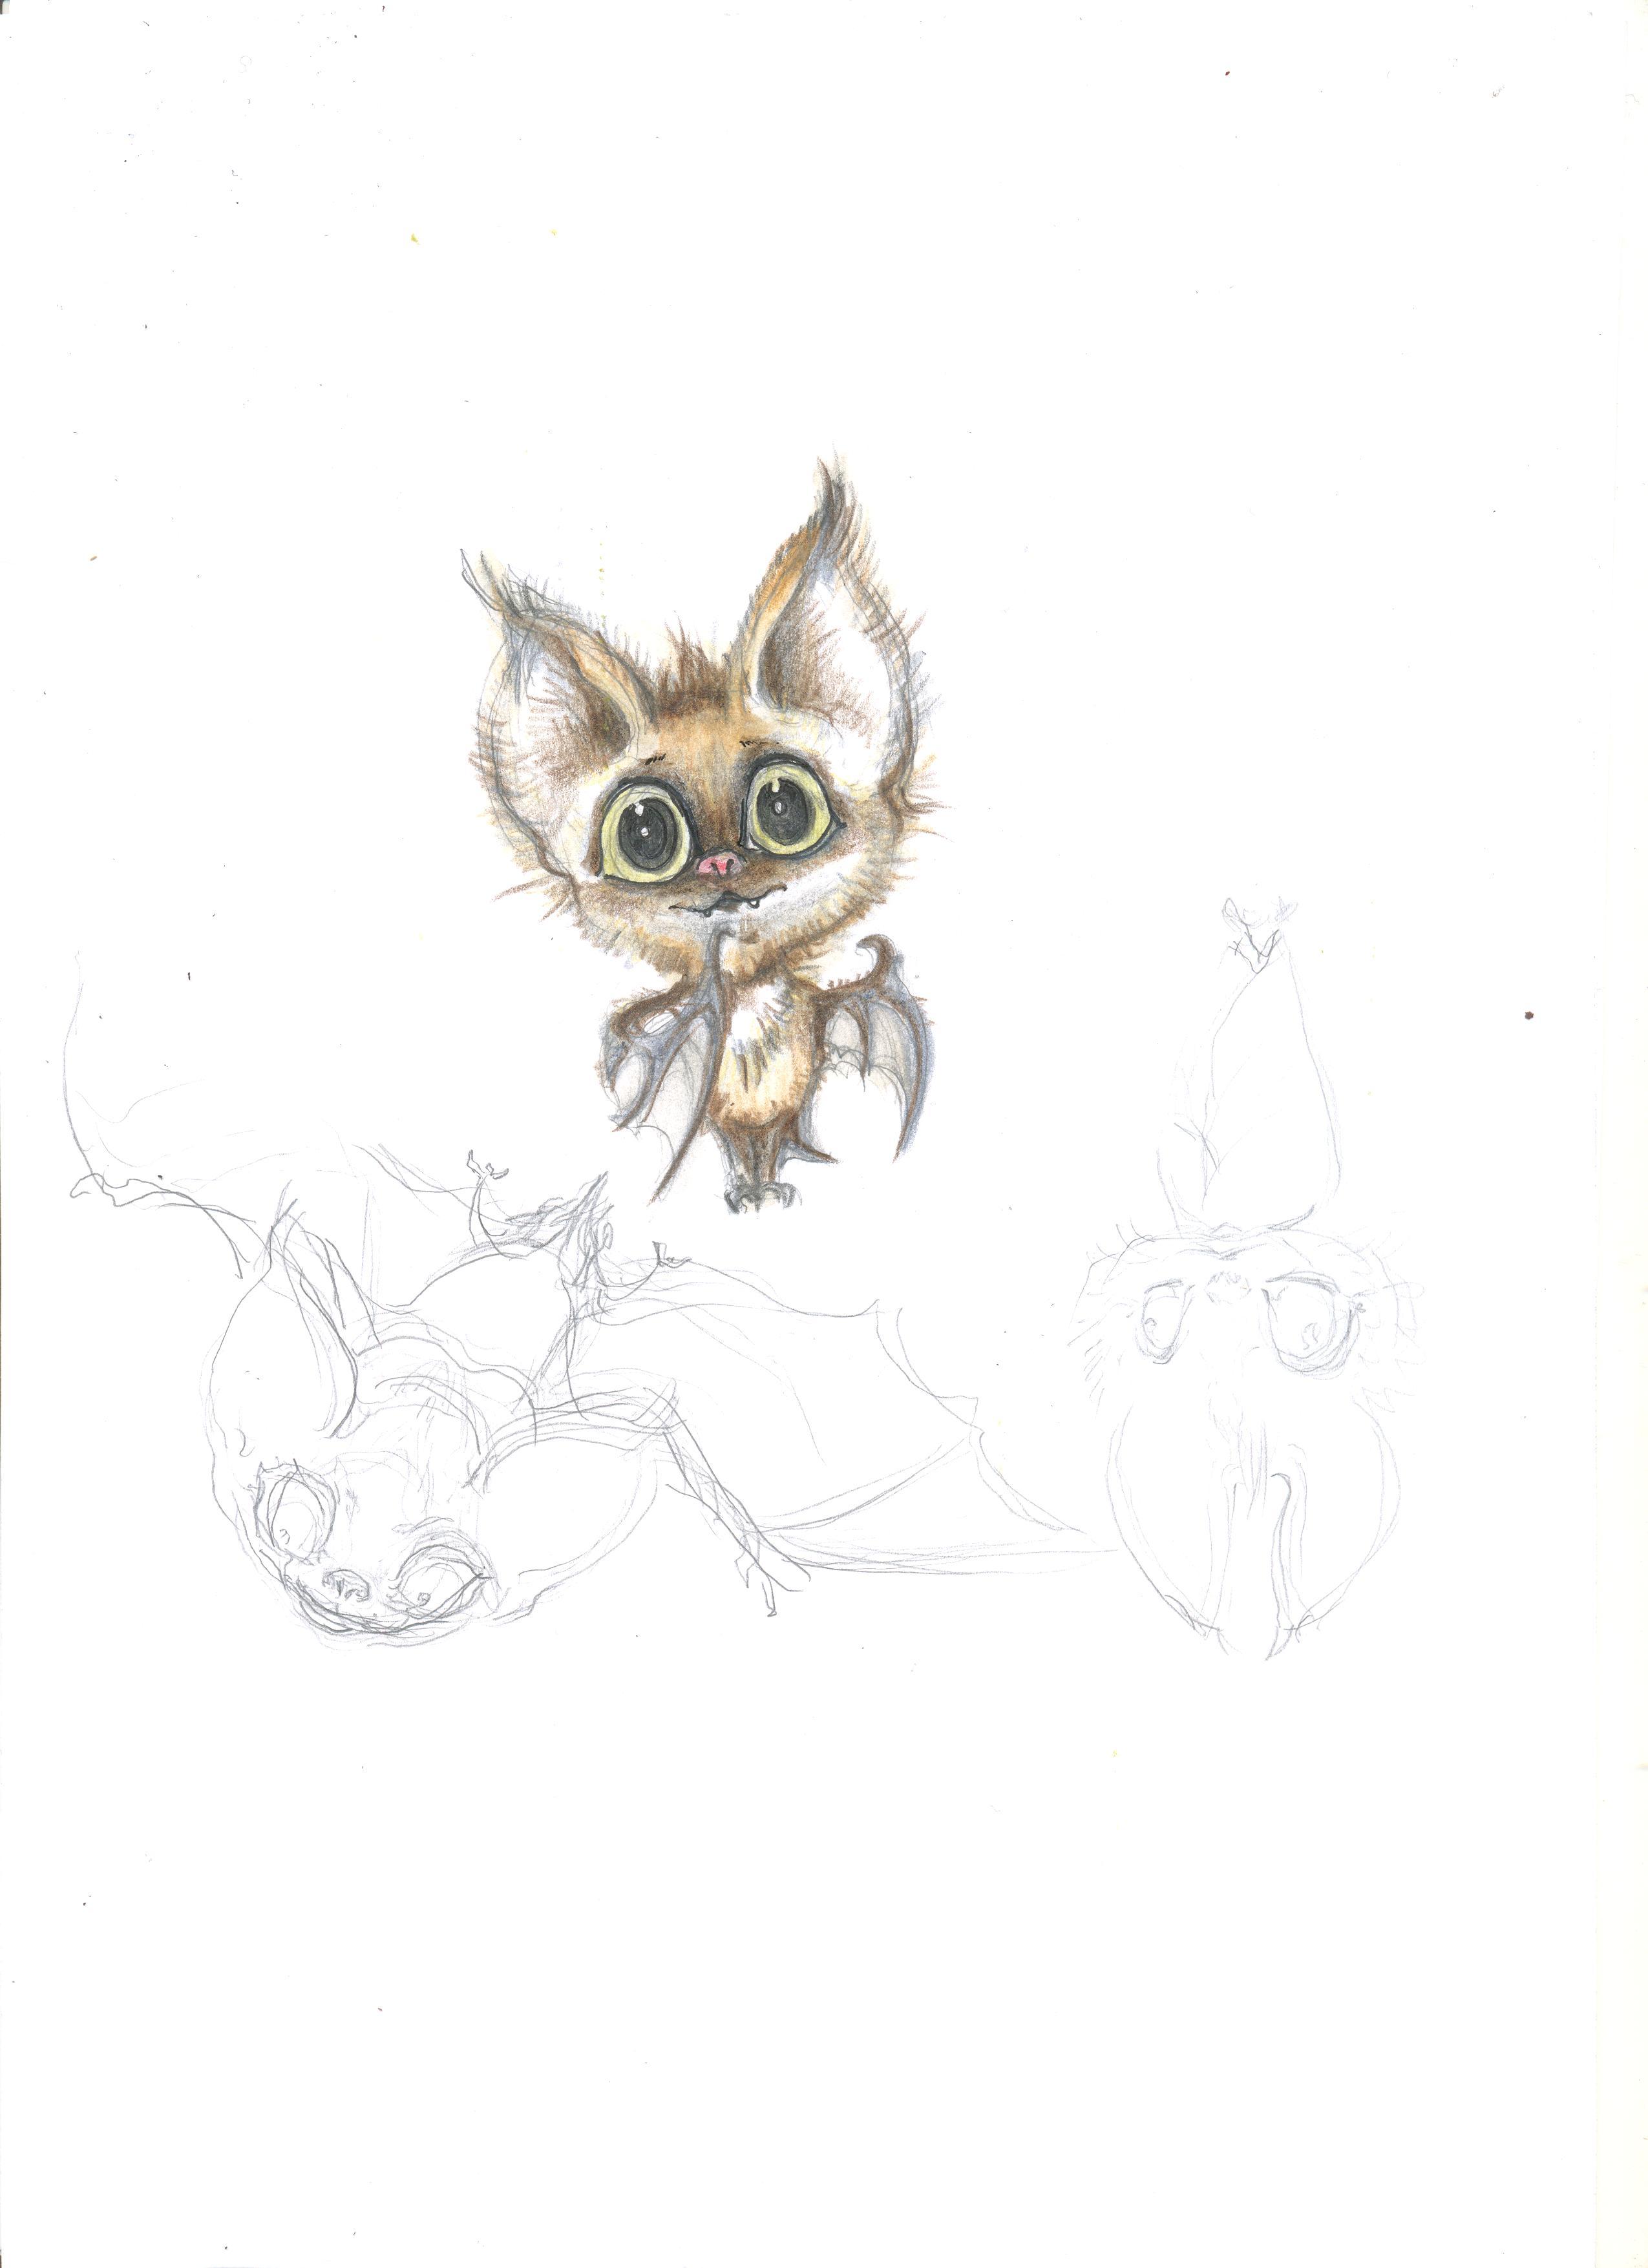 Нарисовать персонажа для анимации фото f_4495c88e2e23aa58.jpg